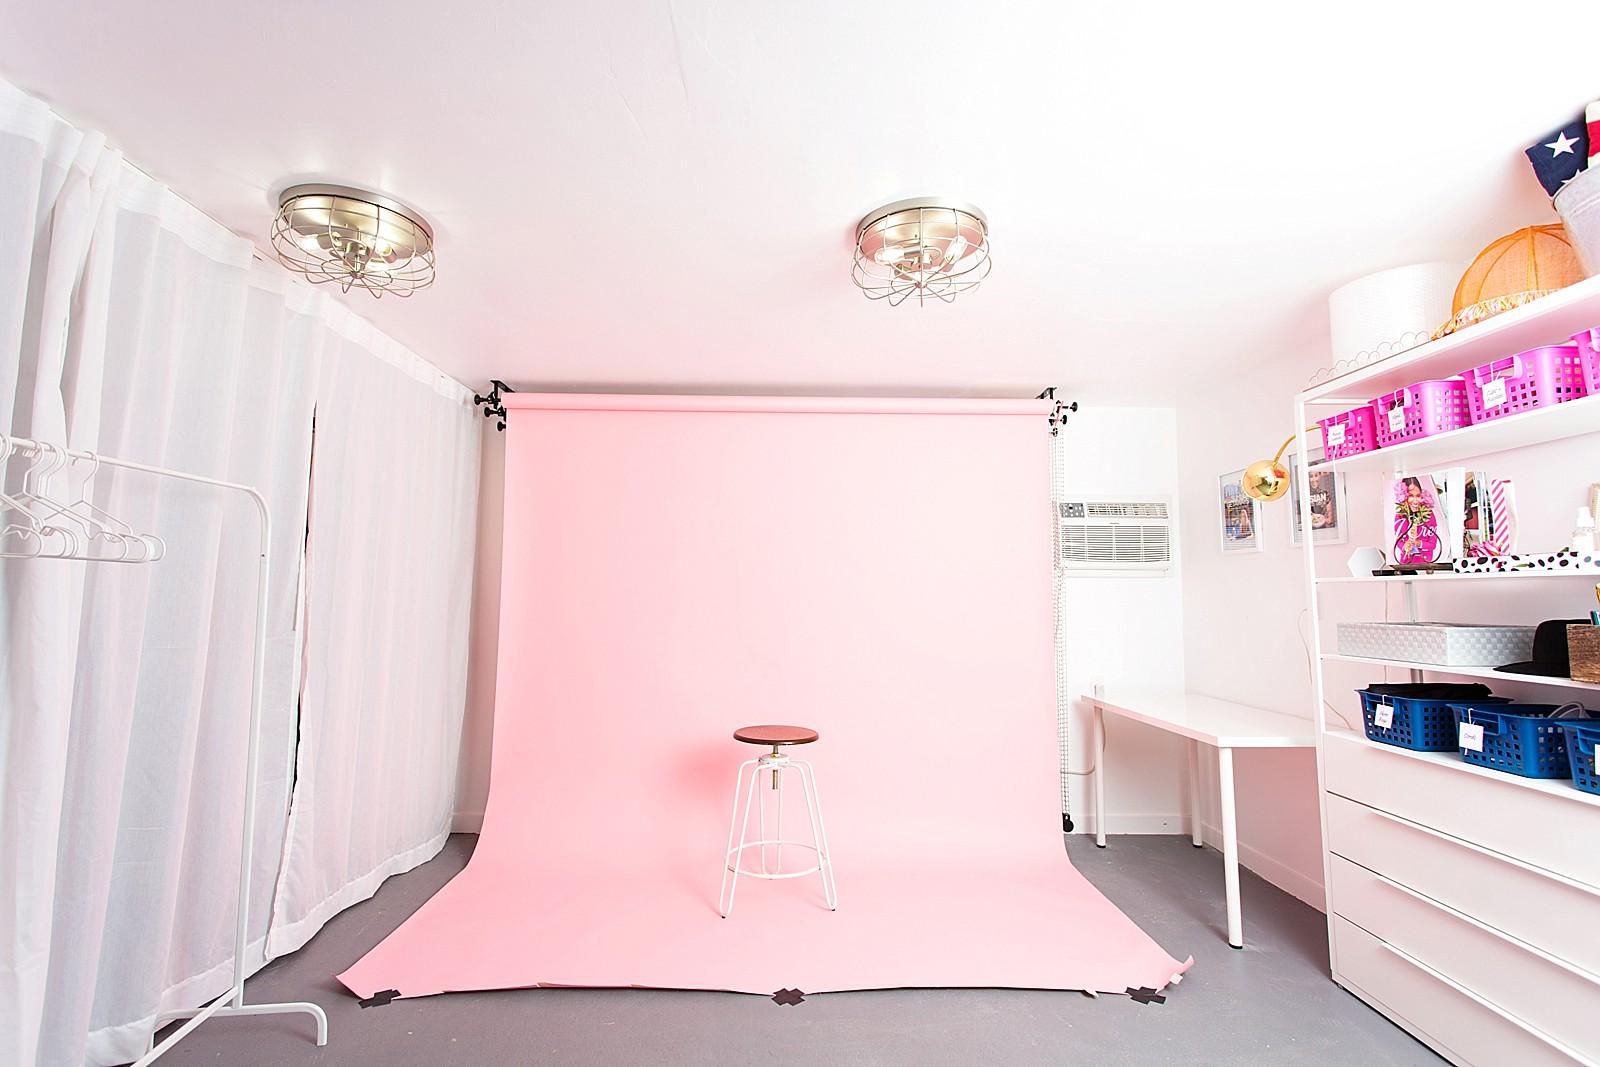 home-photography-studio-storage-tour-photographer-blogger-arizona-diana-elizabeth-blog-2004